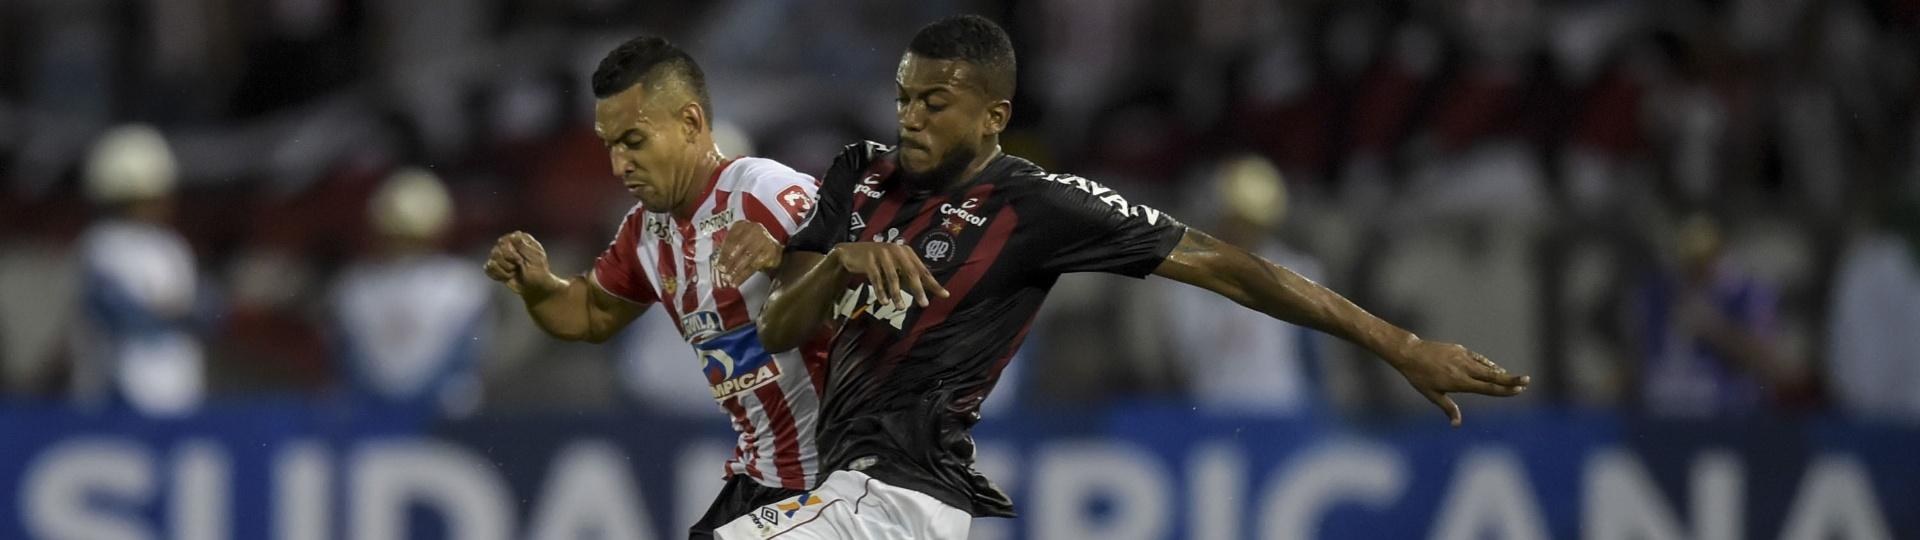 Marcelo Cirino disputa bola durante Junior de Barranquilla x Atlético-PR